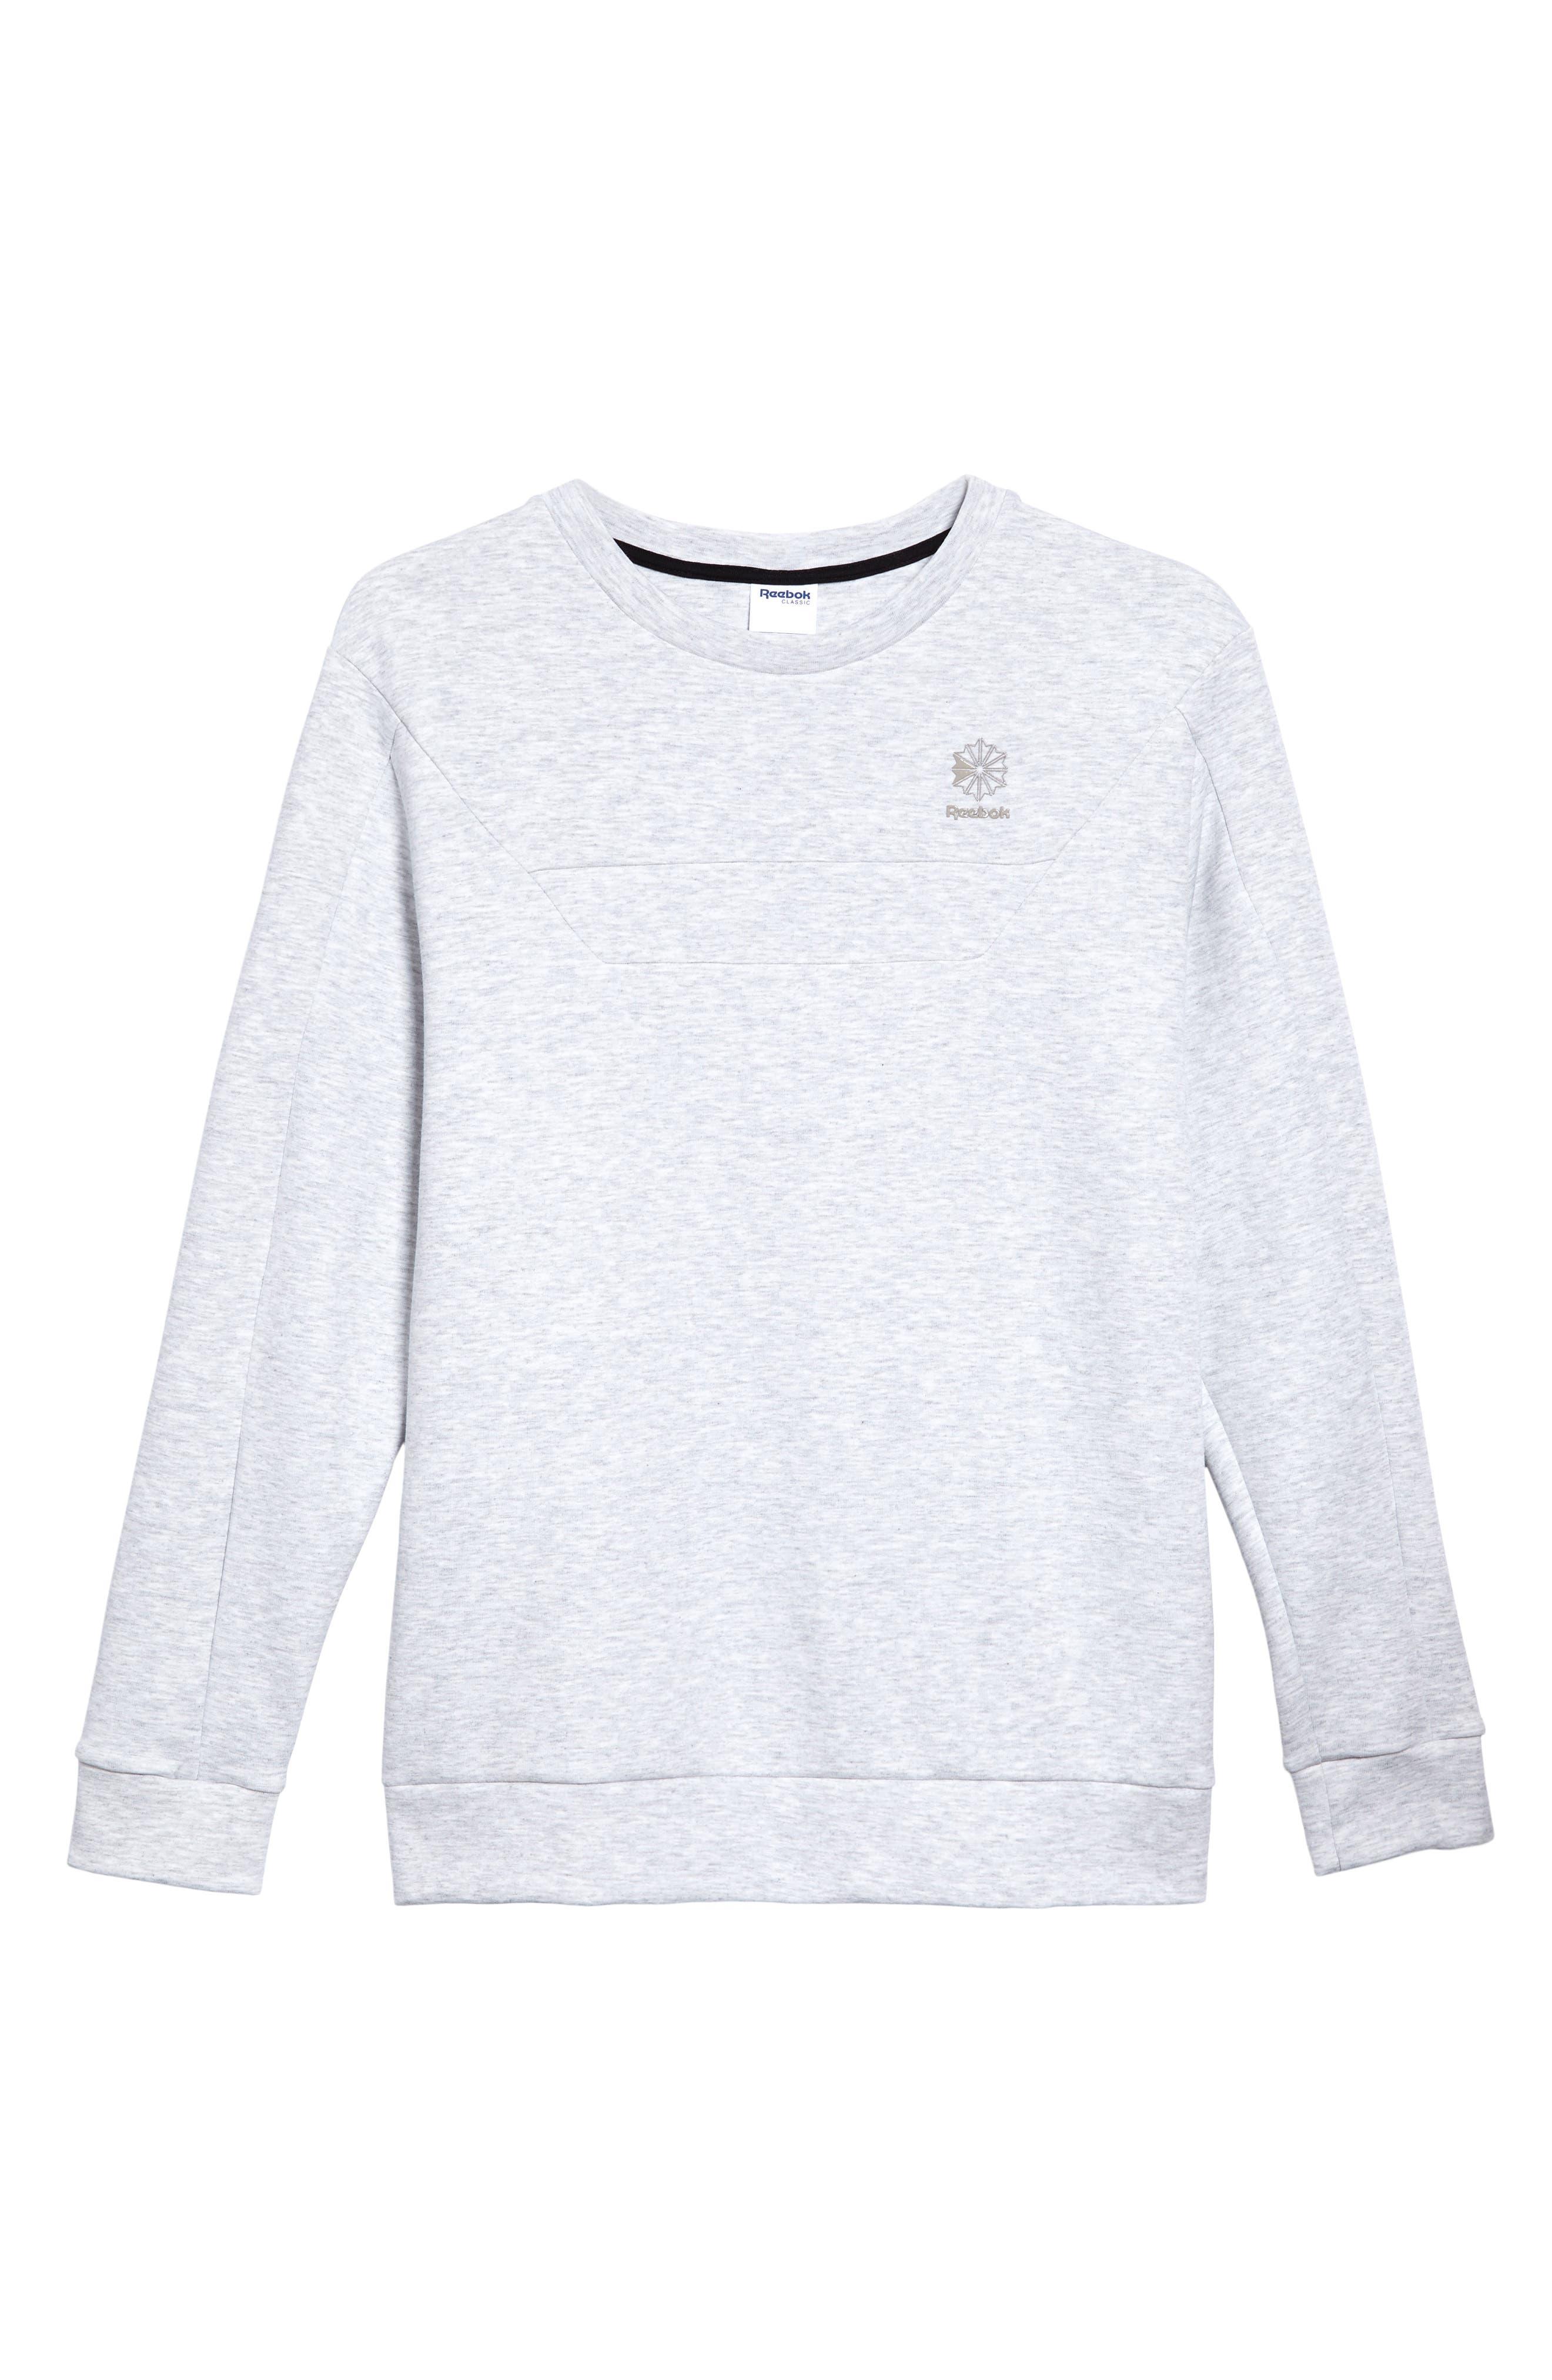 Double Sweatshirt,                             Alternate thumbnail 6, color,